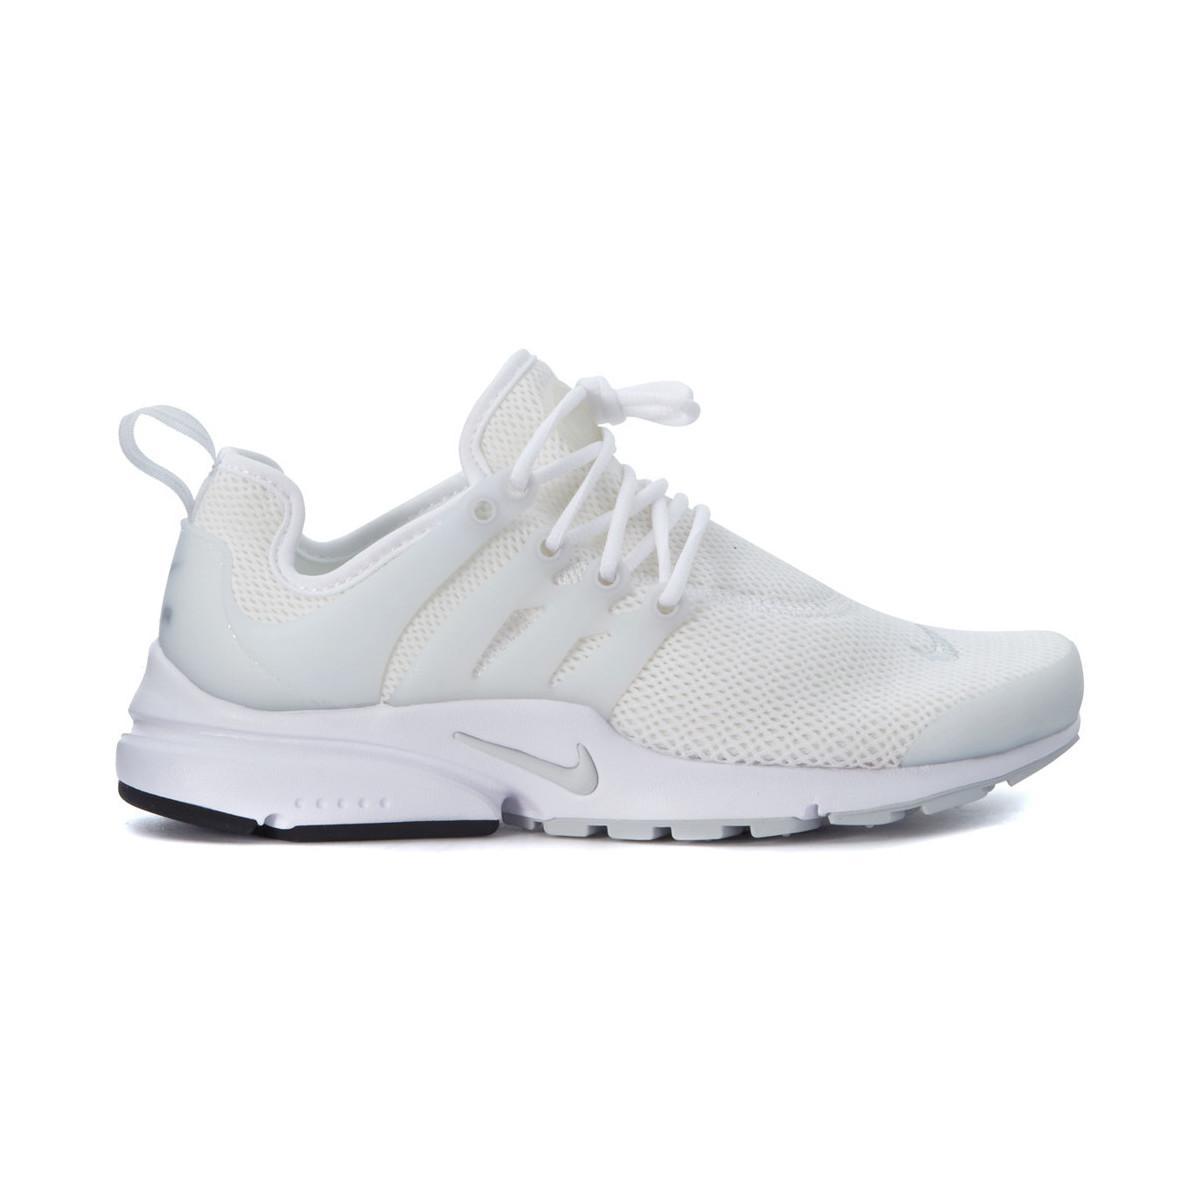 buy online ab214 6bf7d Nike Sneaker Air Presto In White Elastic Mesh Women s Trainers In ...